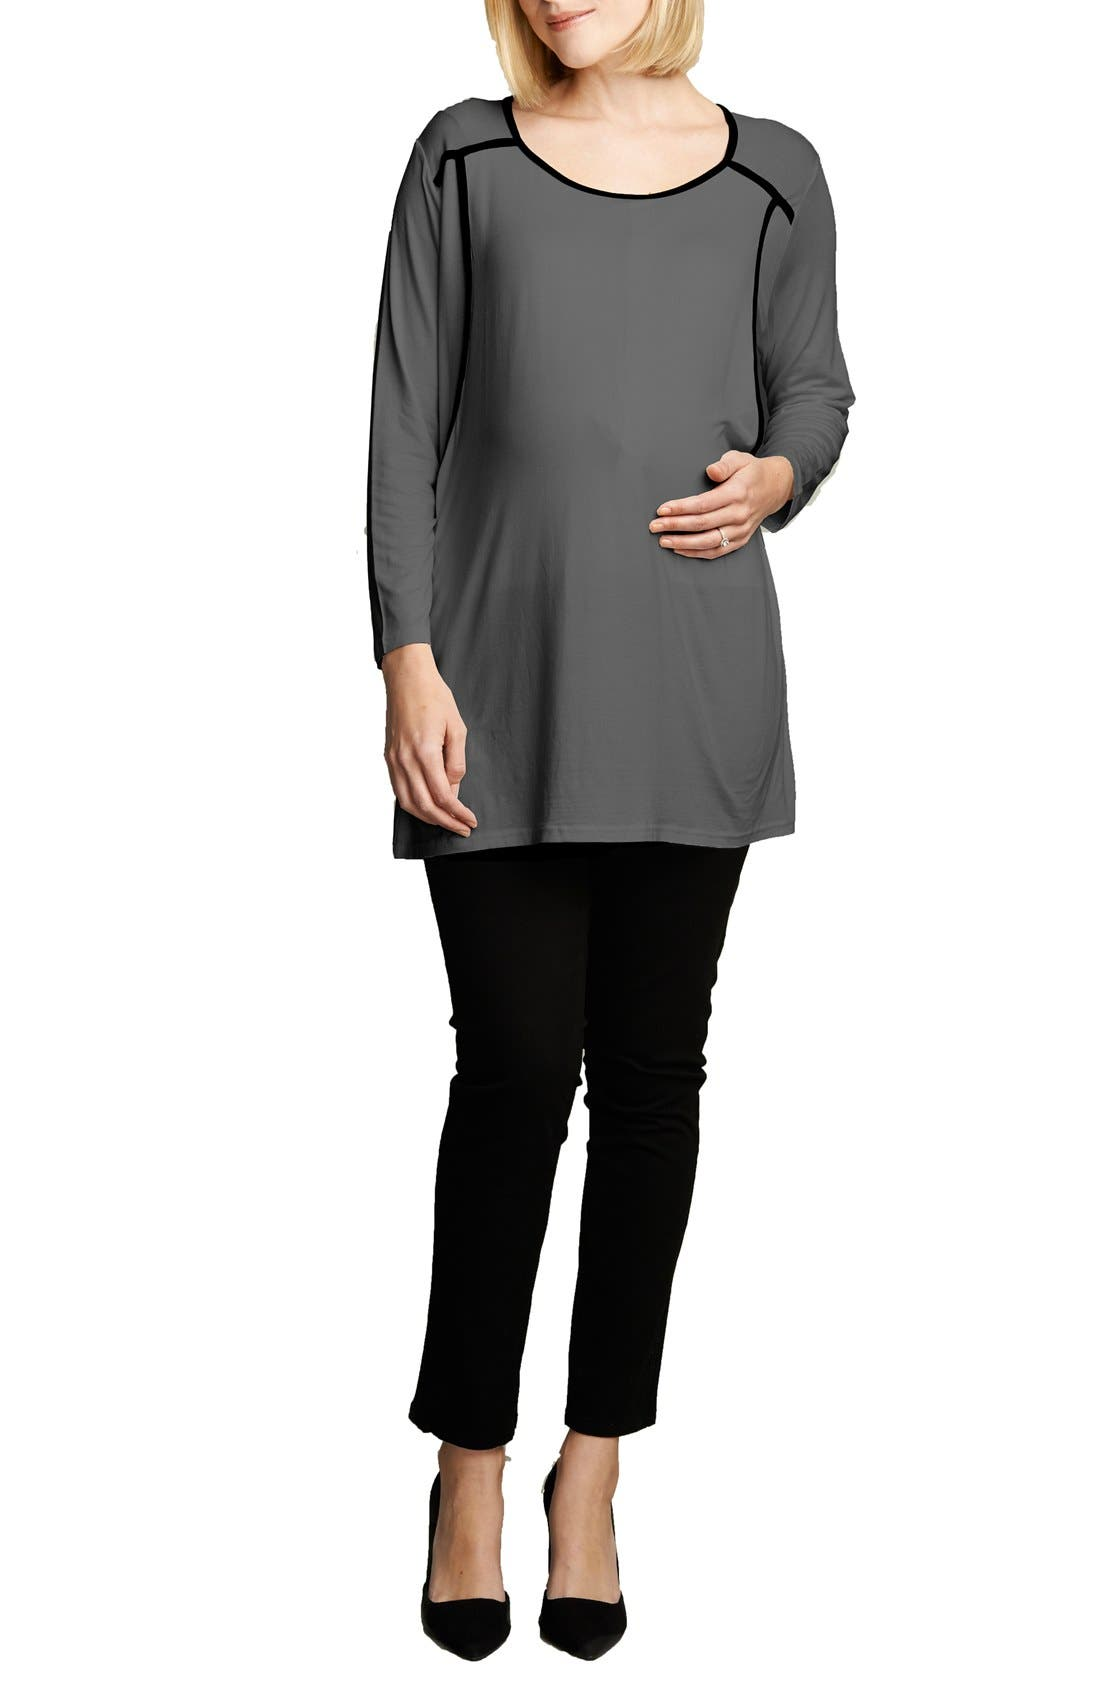 Alternate Image 1 Selected - Maternal America Long Sleeve Nursing Top